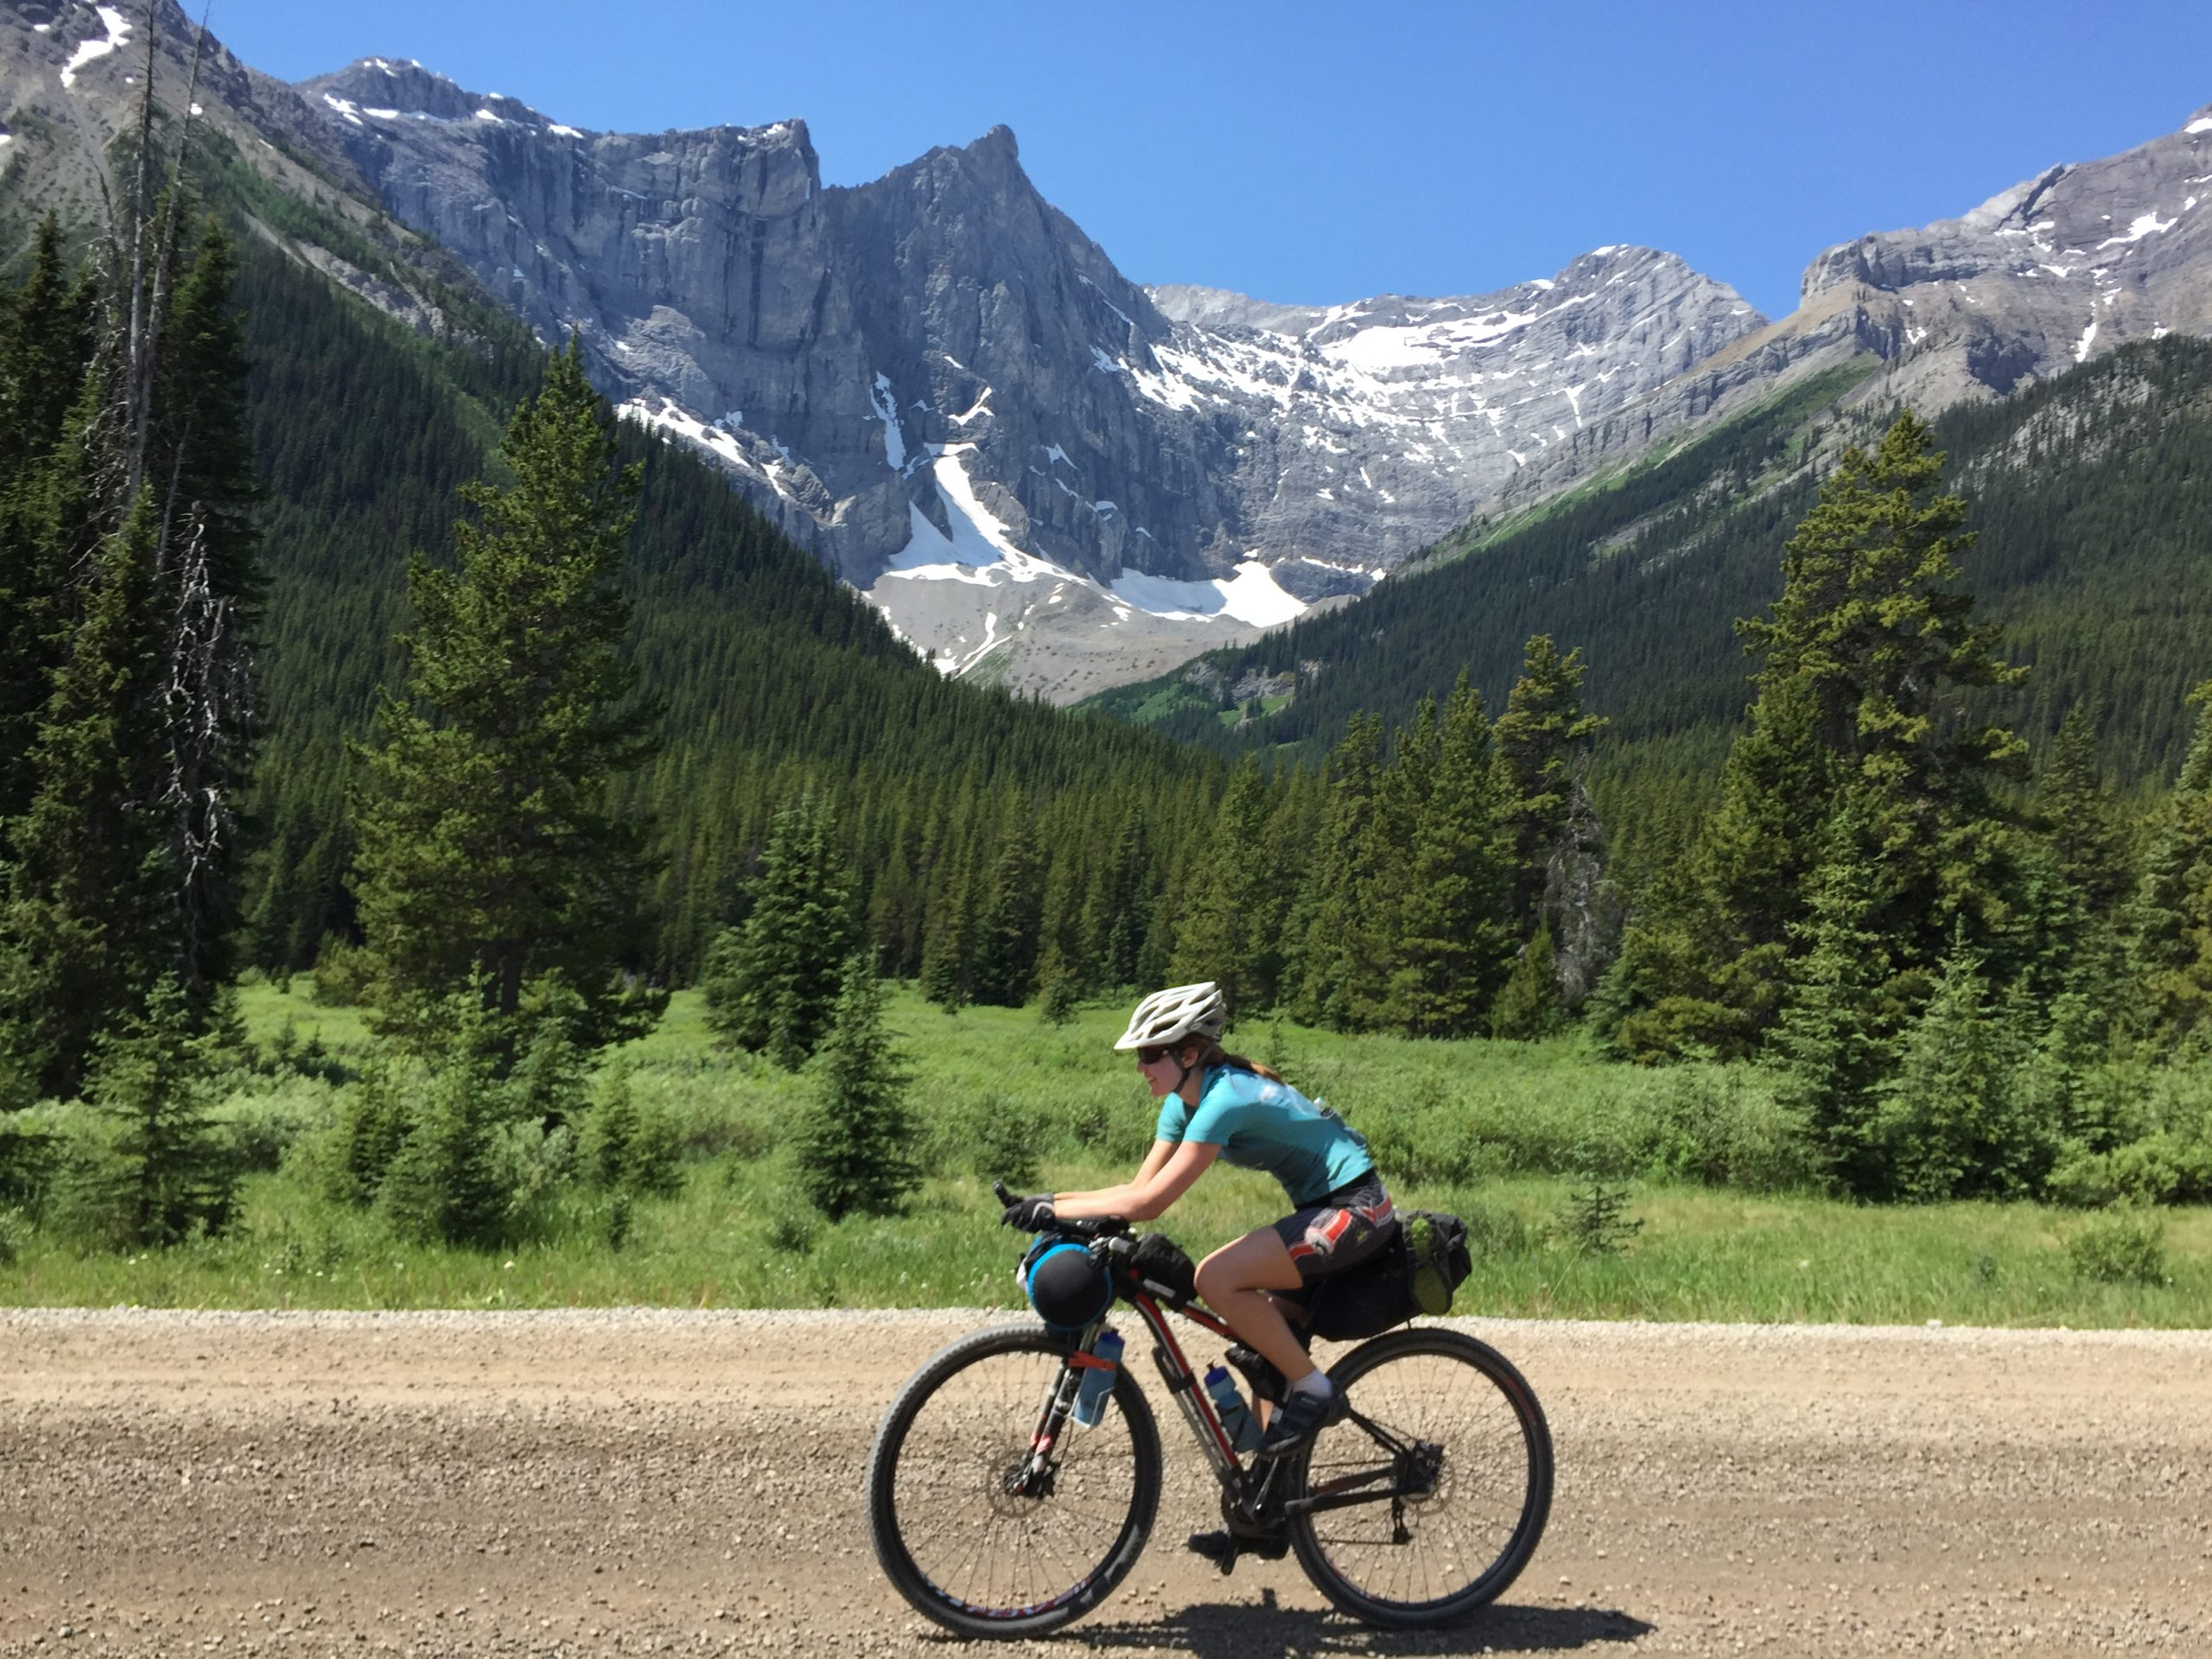 Riding through the Rockies